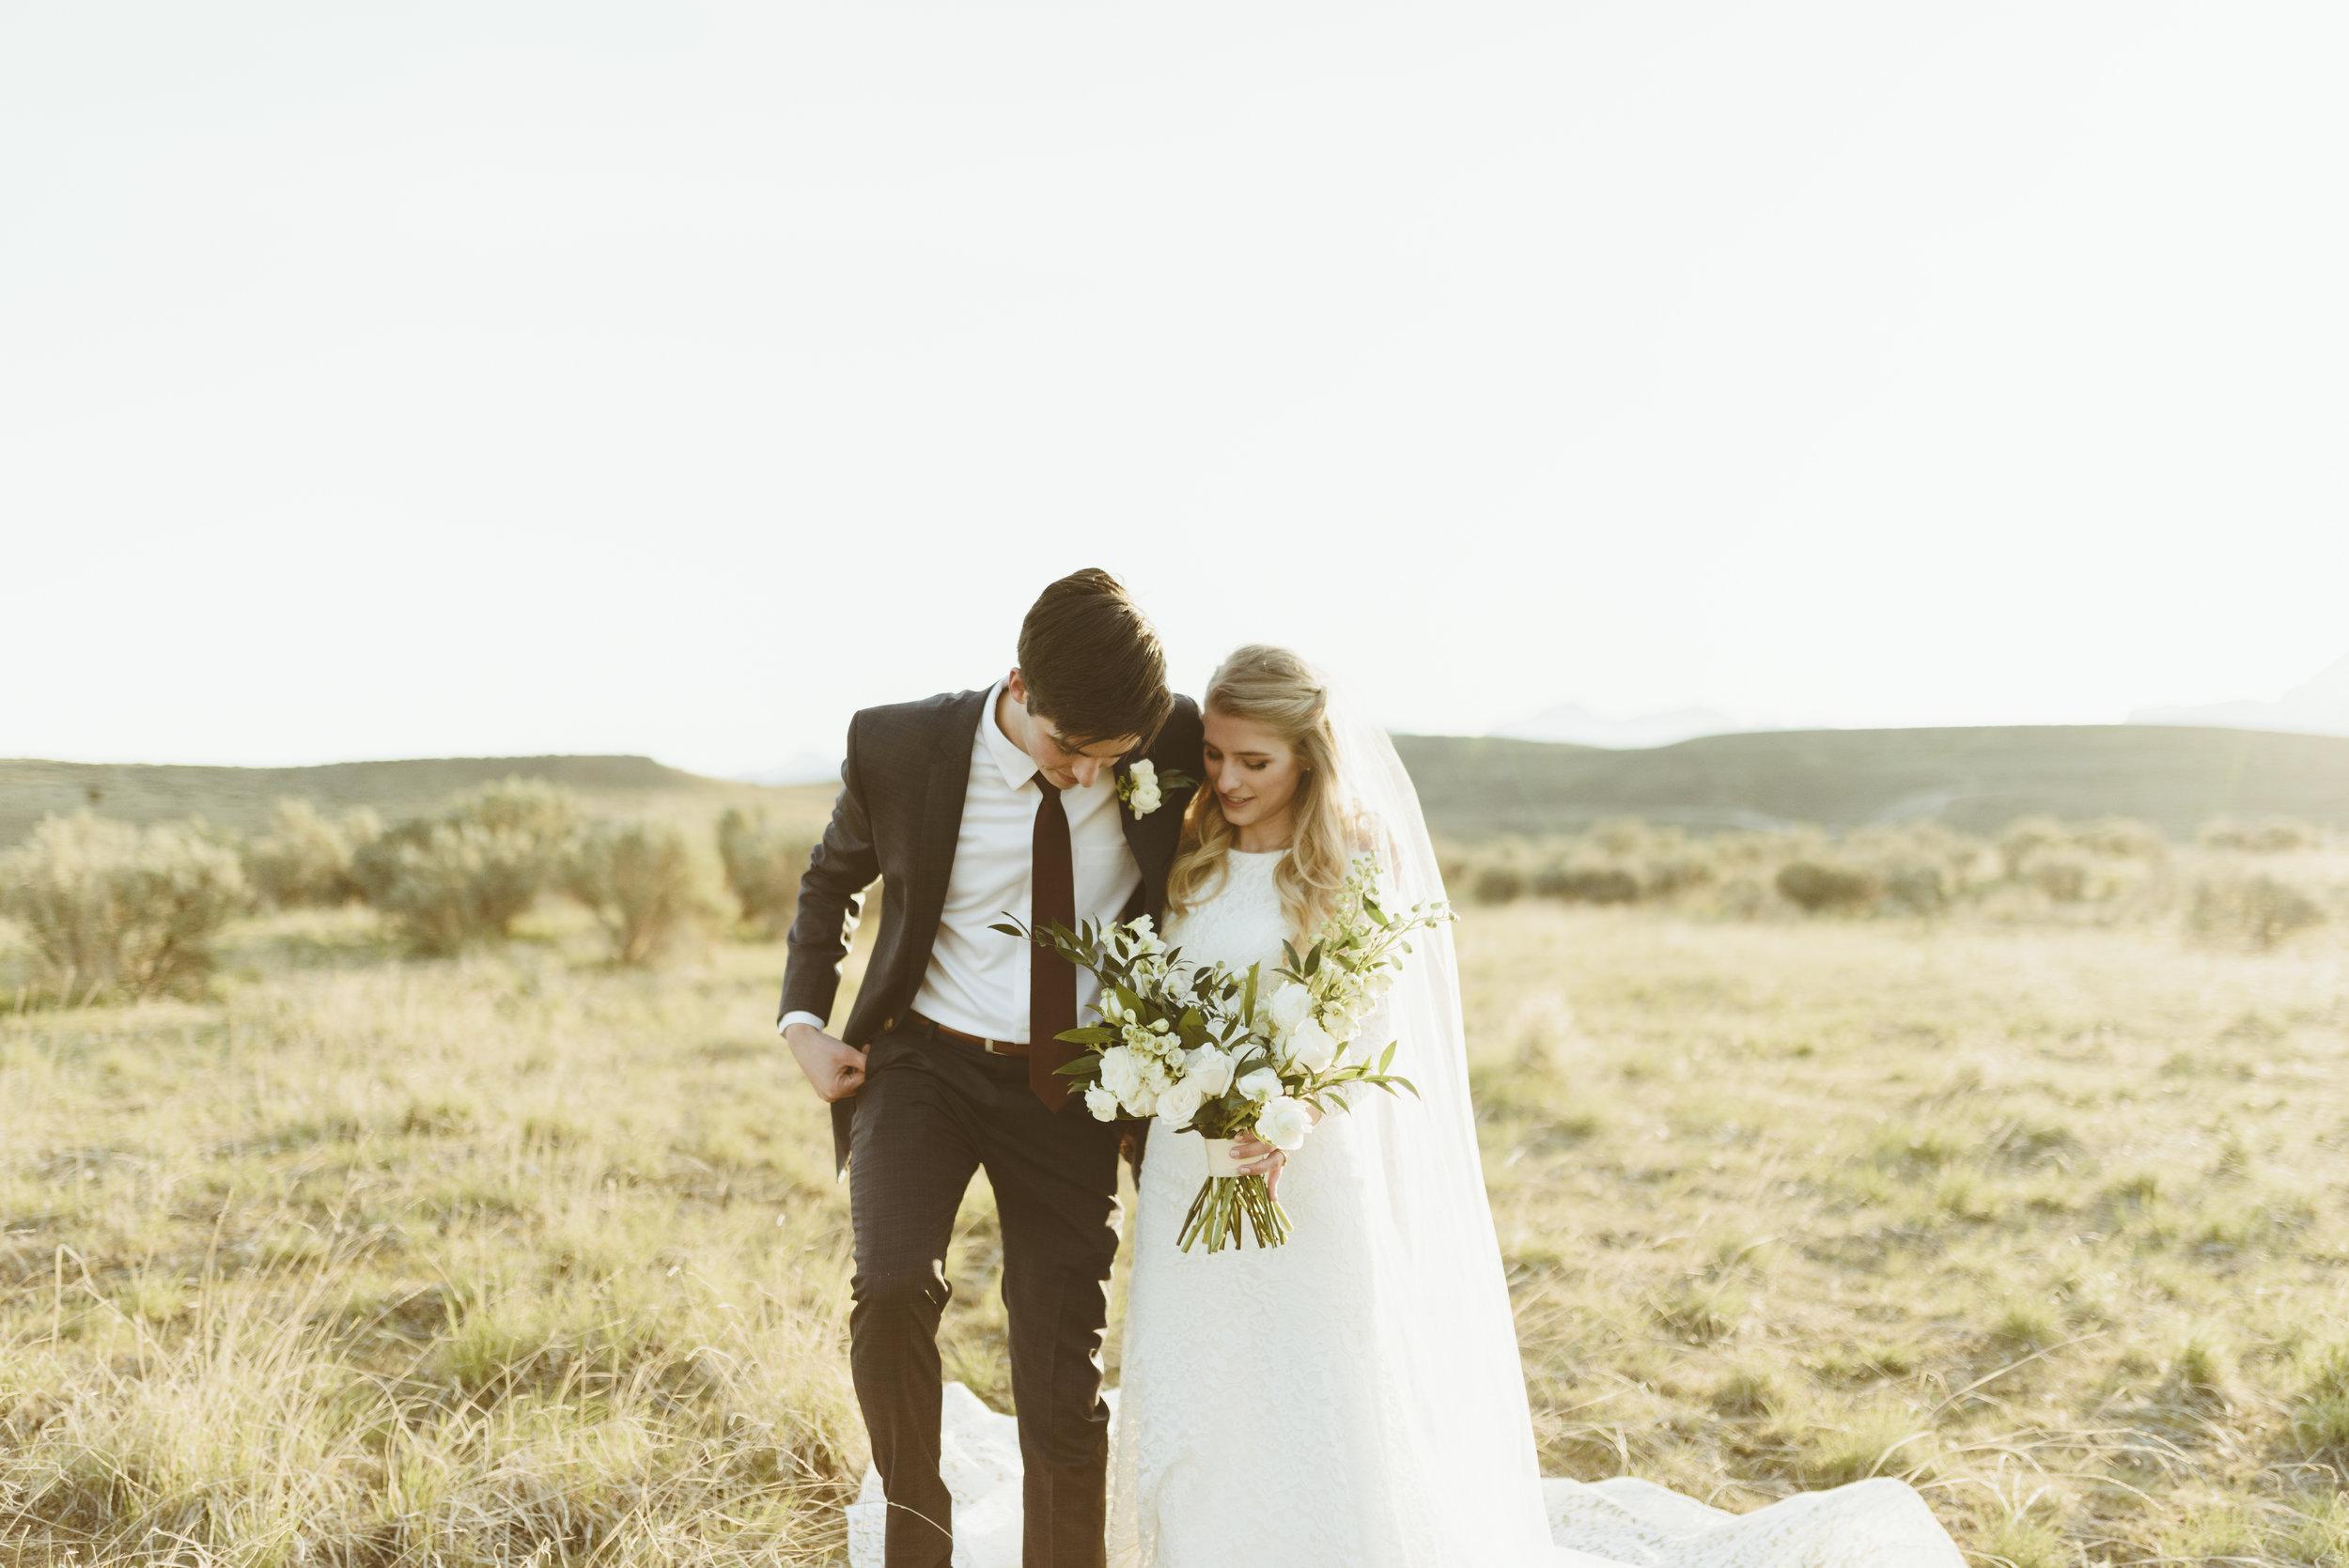 md_bridals-12.jpg